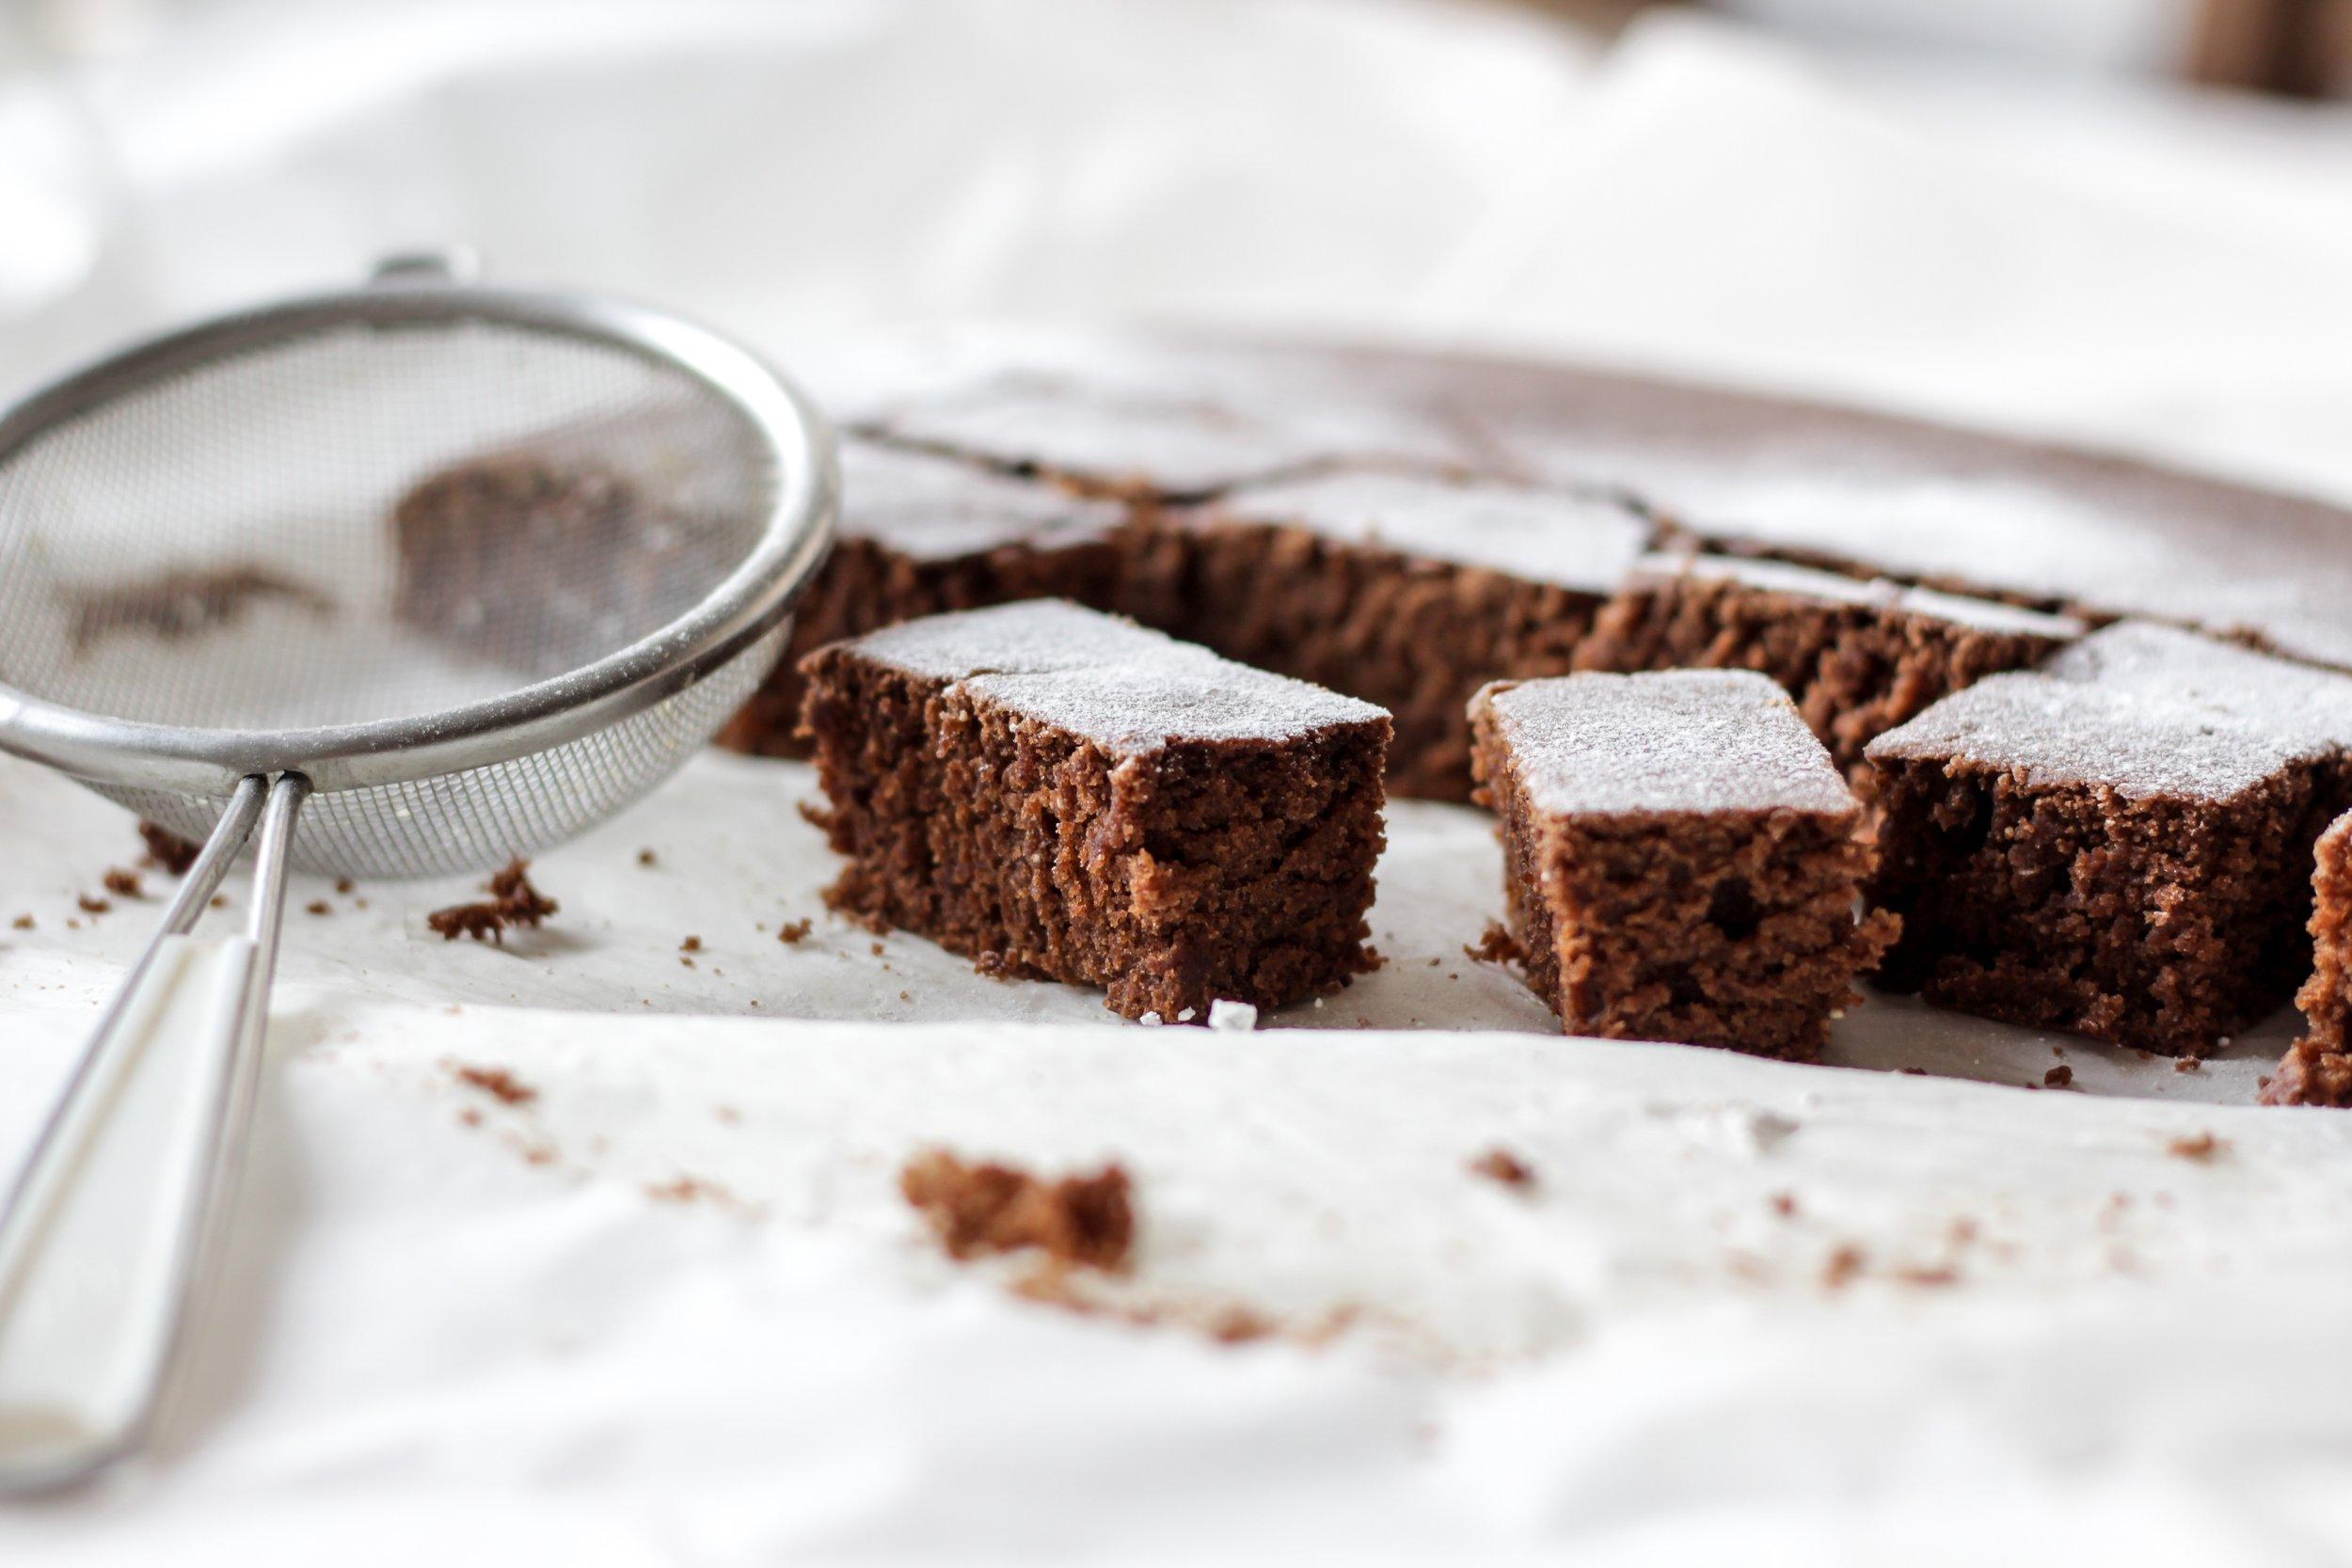 Steve's favourite midnight snack? Chocolate cake!